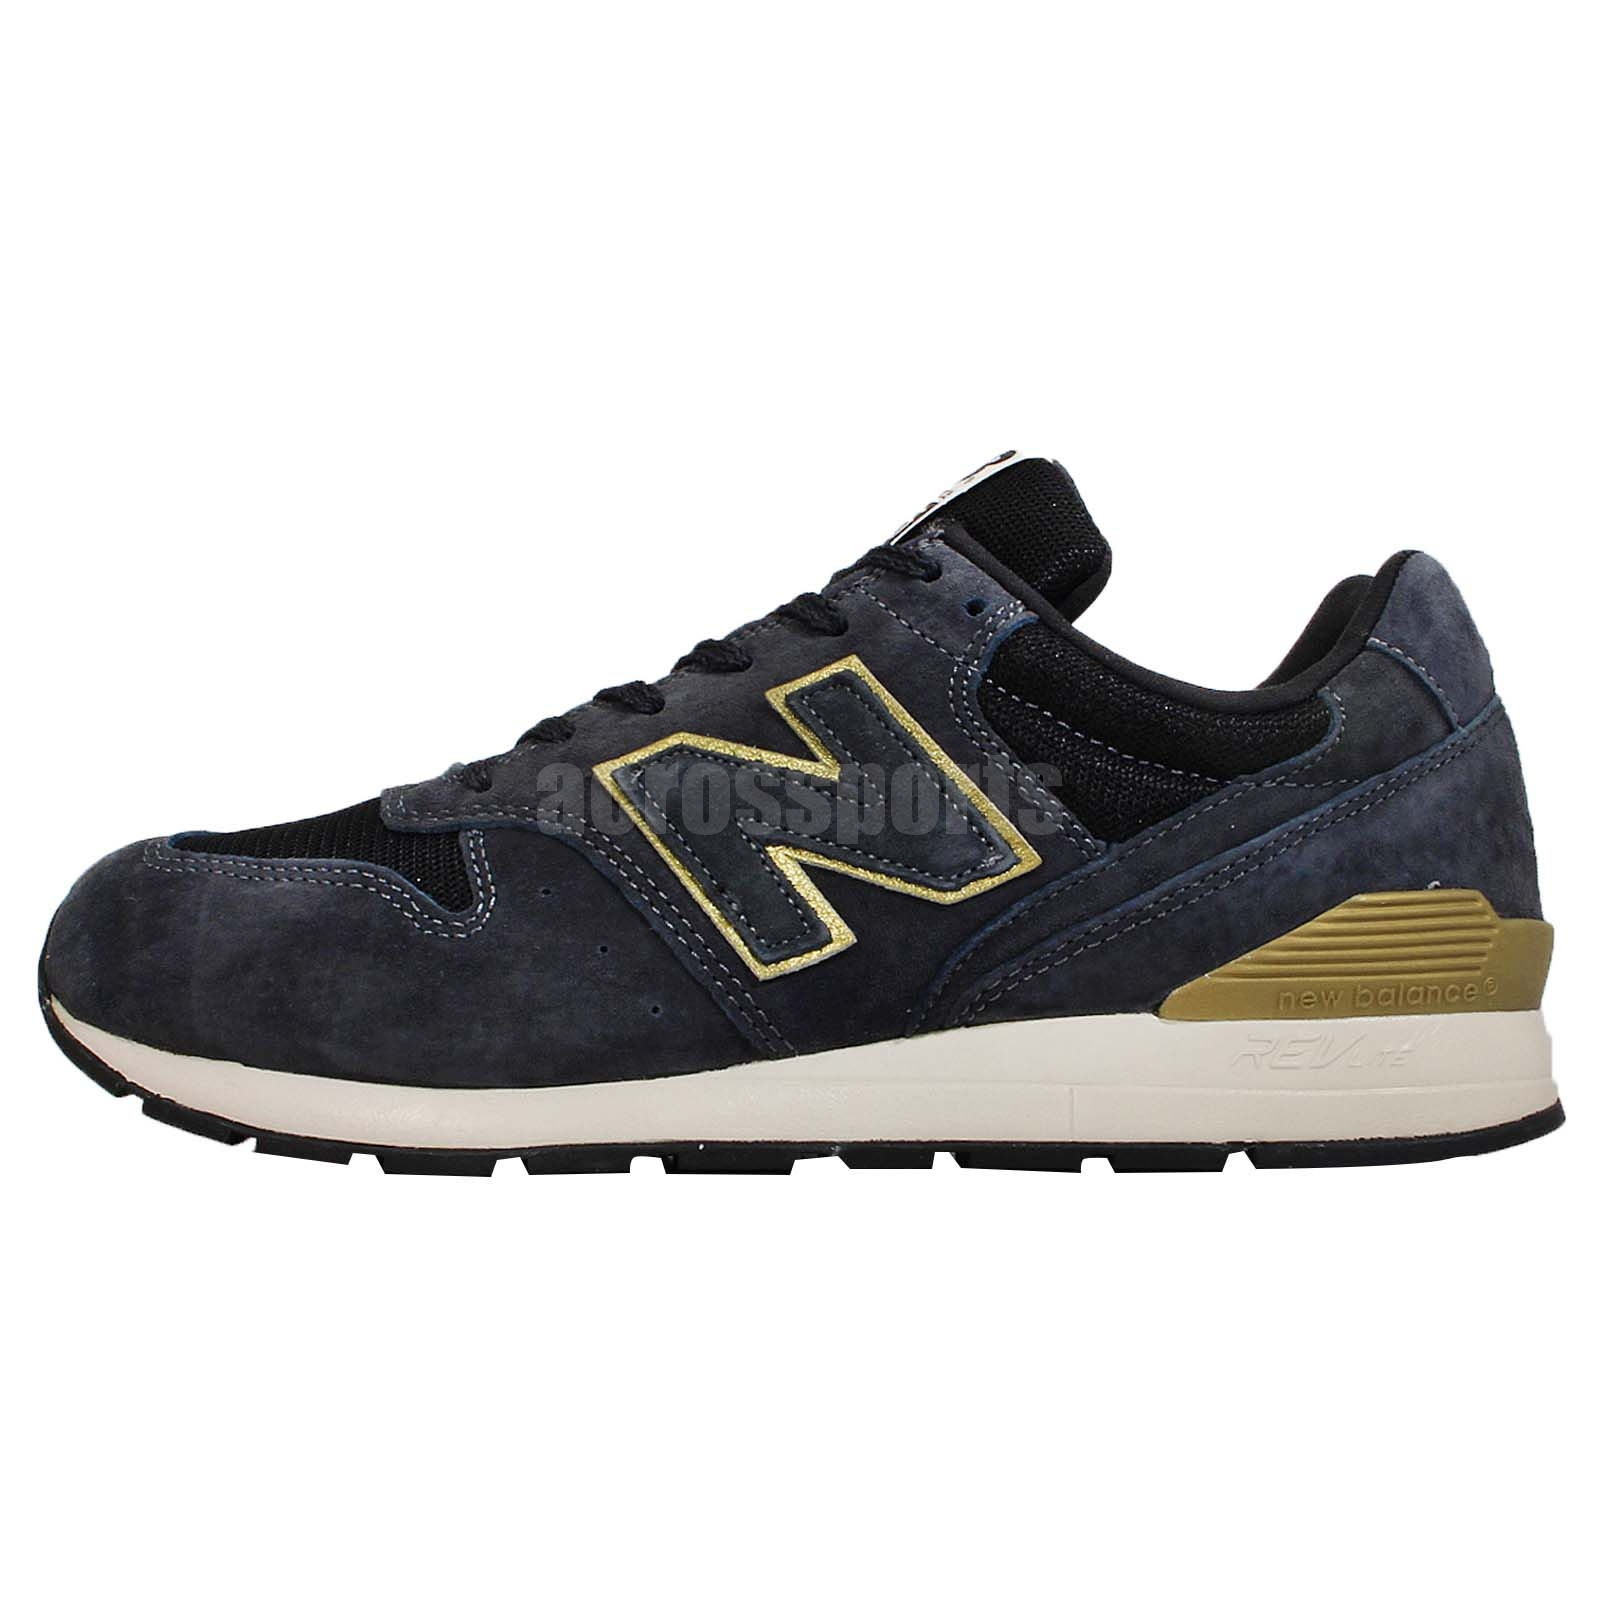 new balance mrl996hb d navy gold revlite mens running shoes mrl996hbd. Black Bedroom Furniture Sets. Home Design Ideas